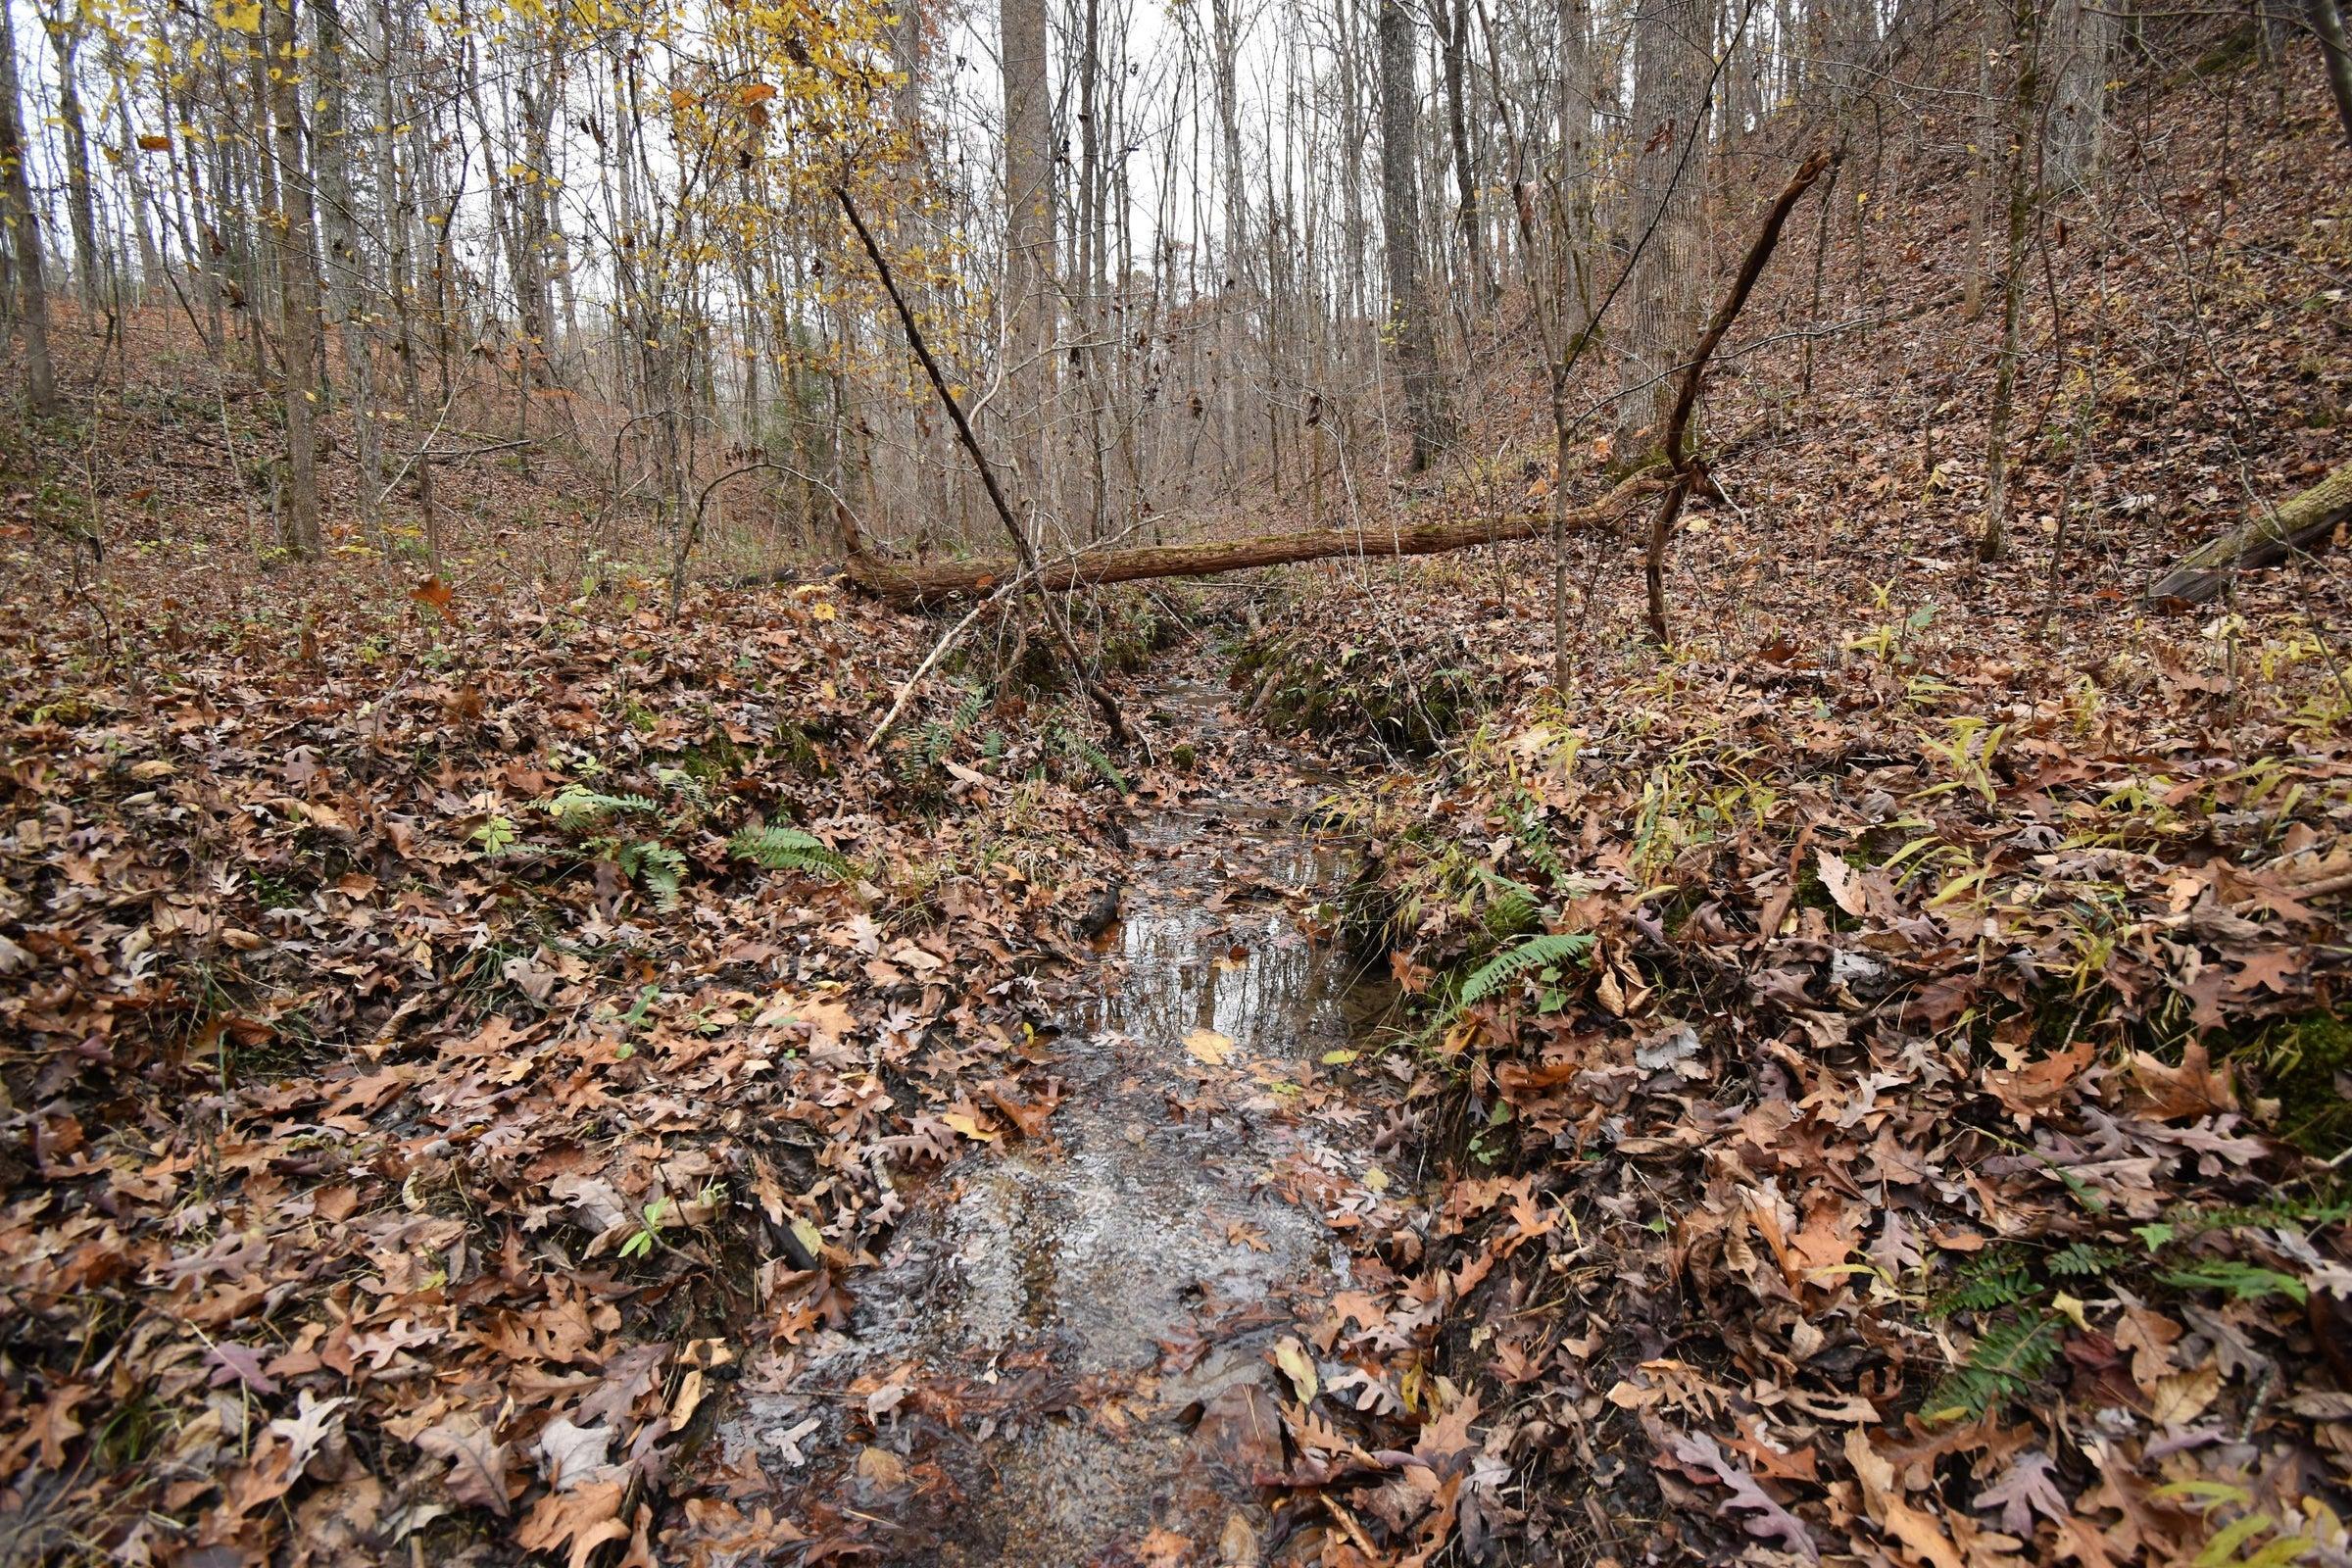 Spring-fed Stream